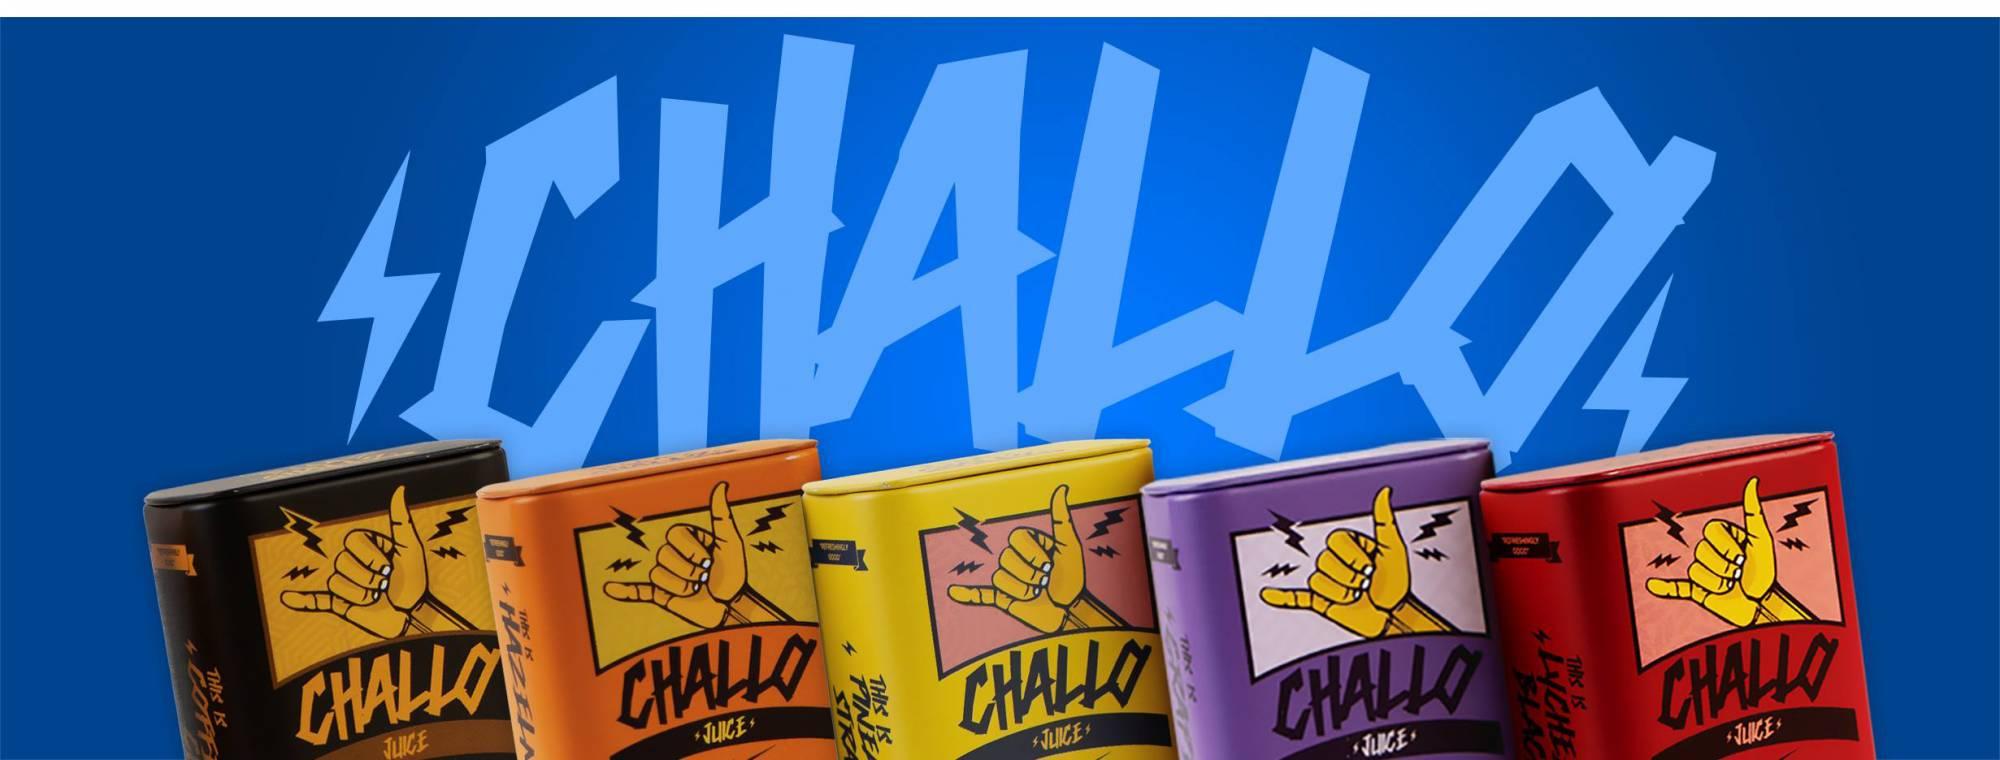 challo